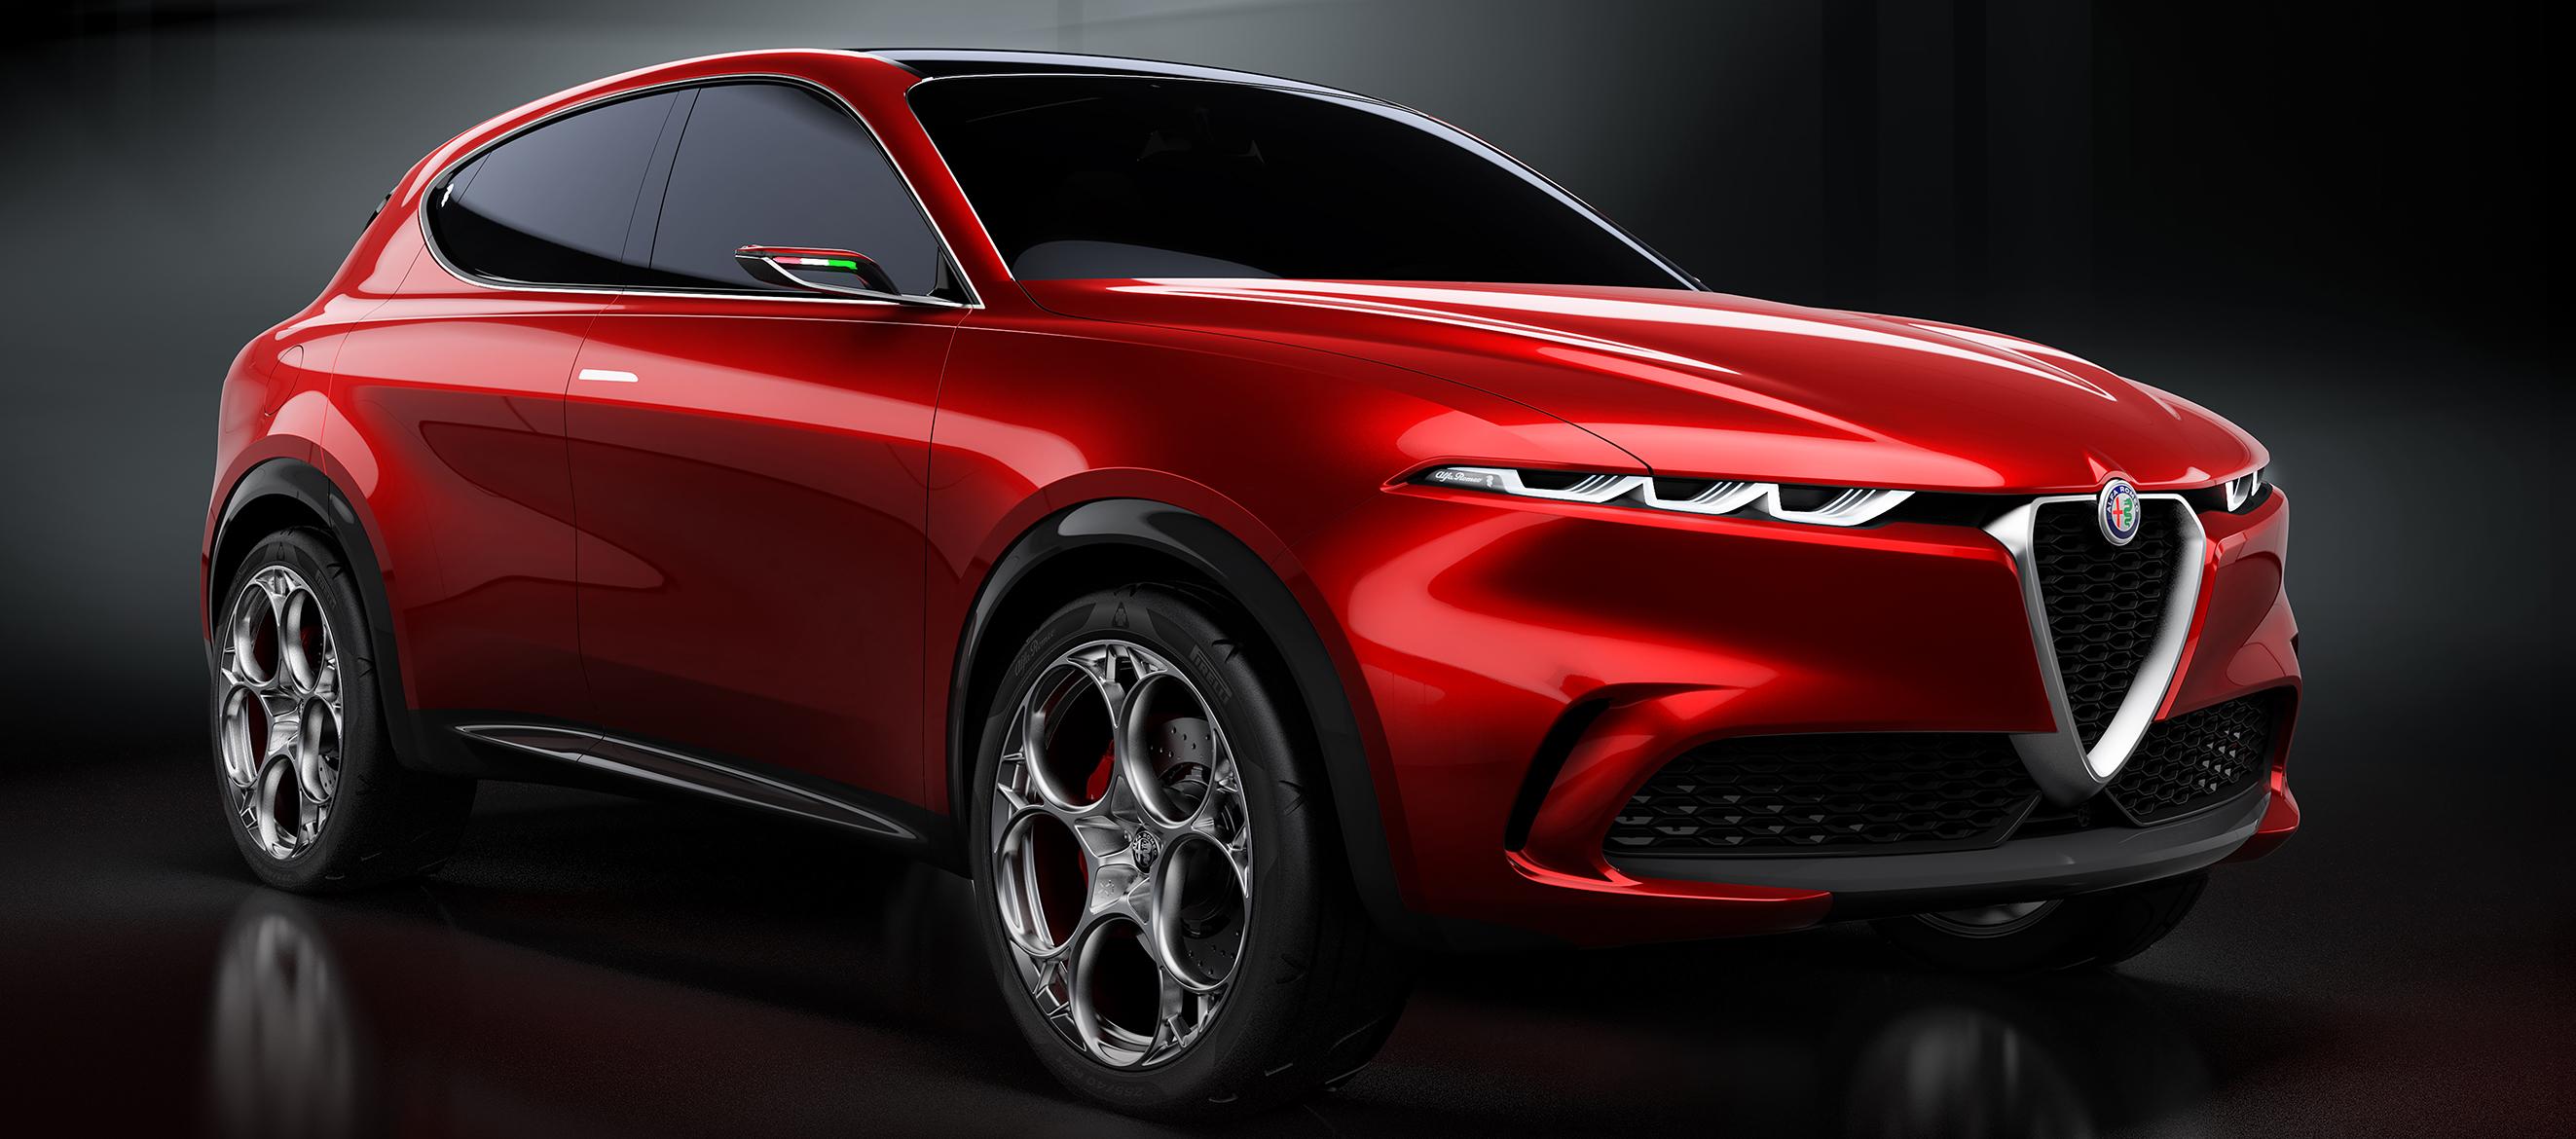 Alfa Romeo Tonale el primer PHEV de la marca